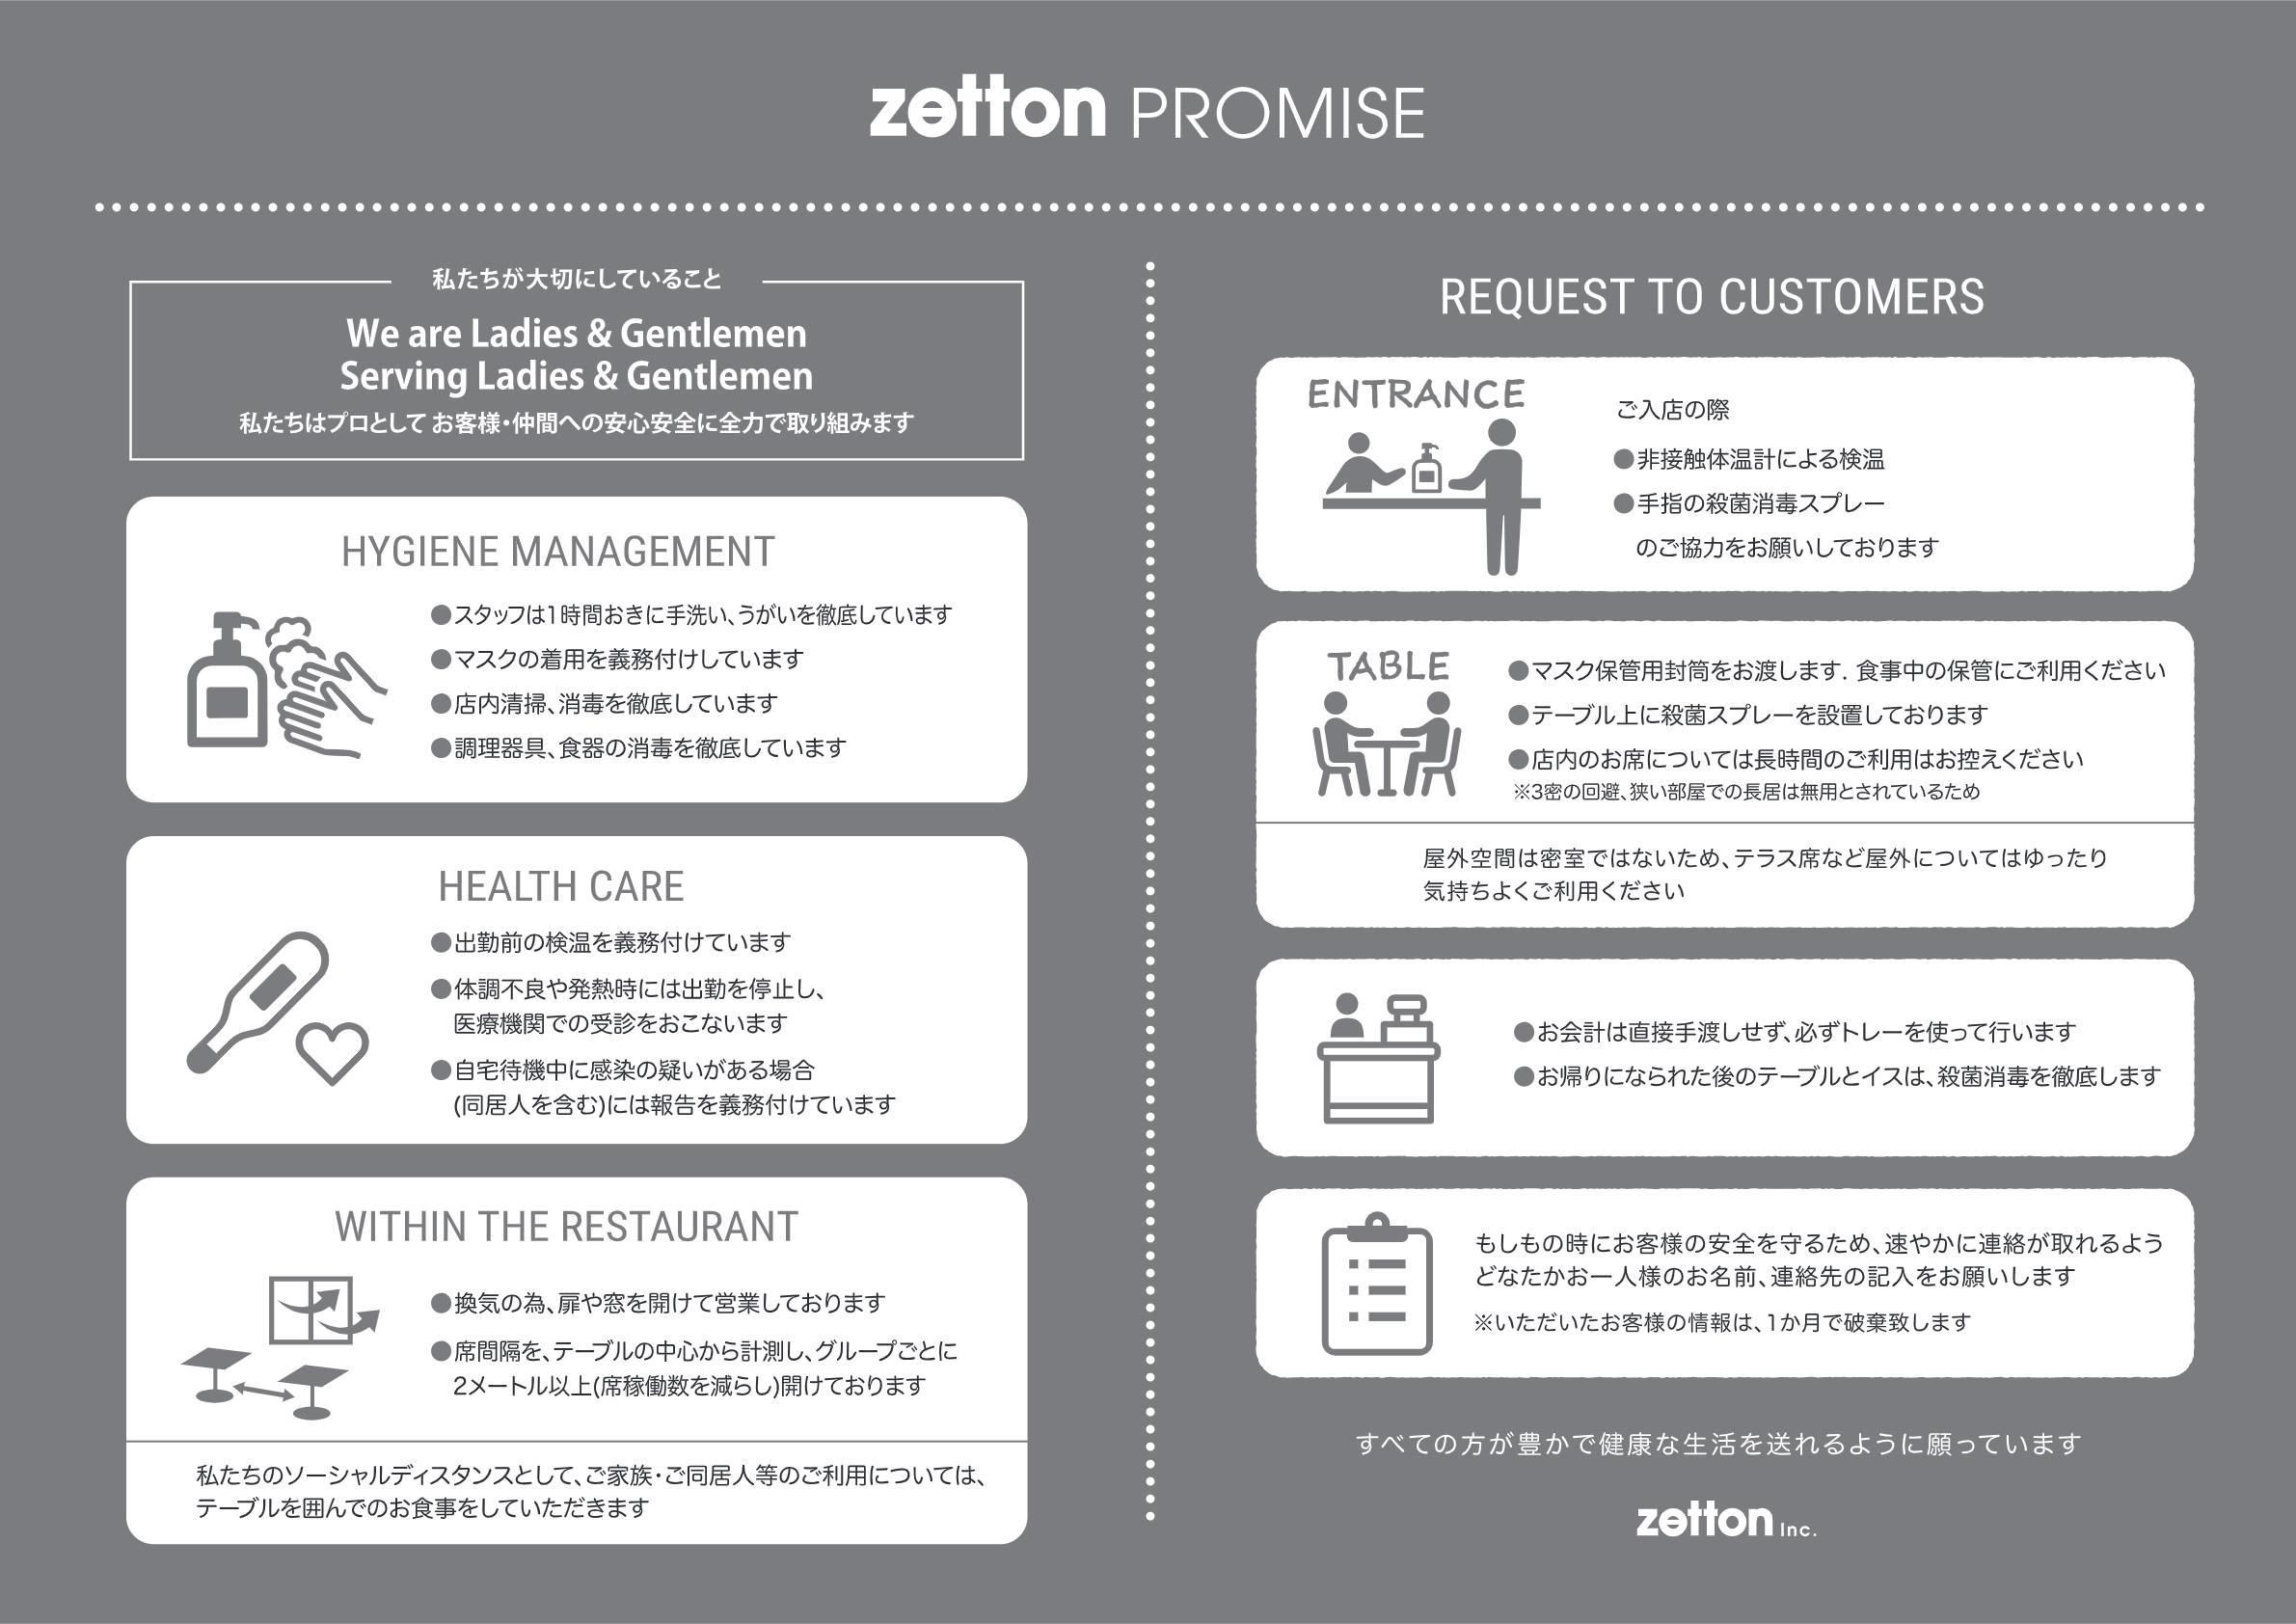 http://www.zetton.co.jp/news/zetton_promise.jpg